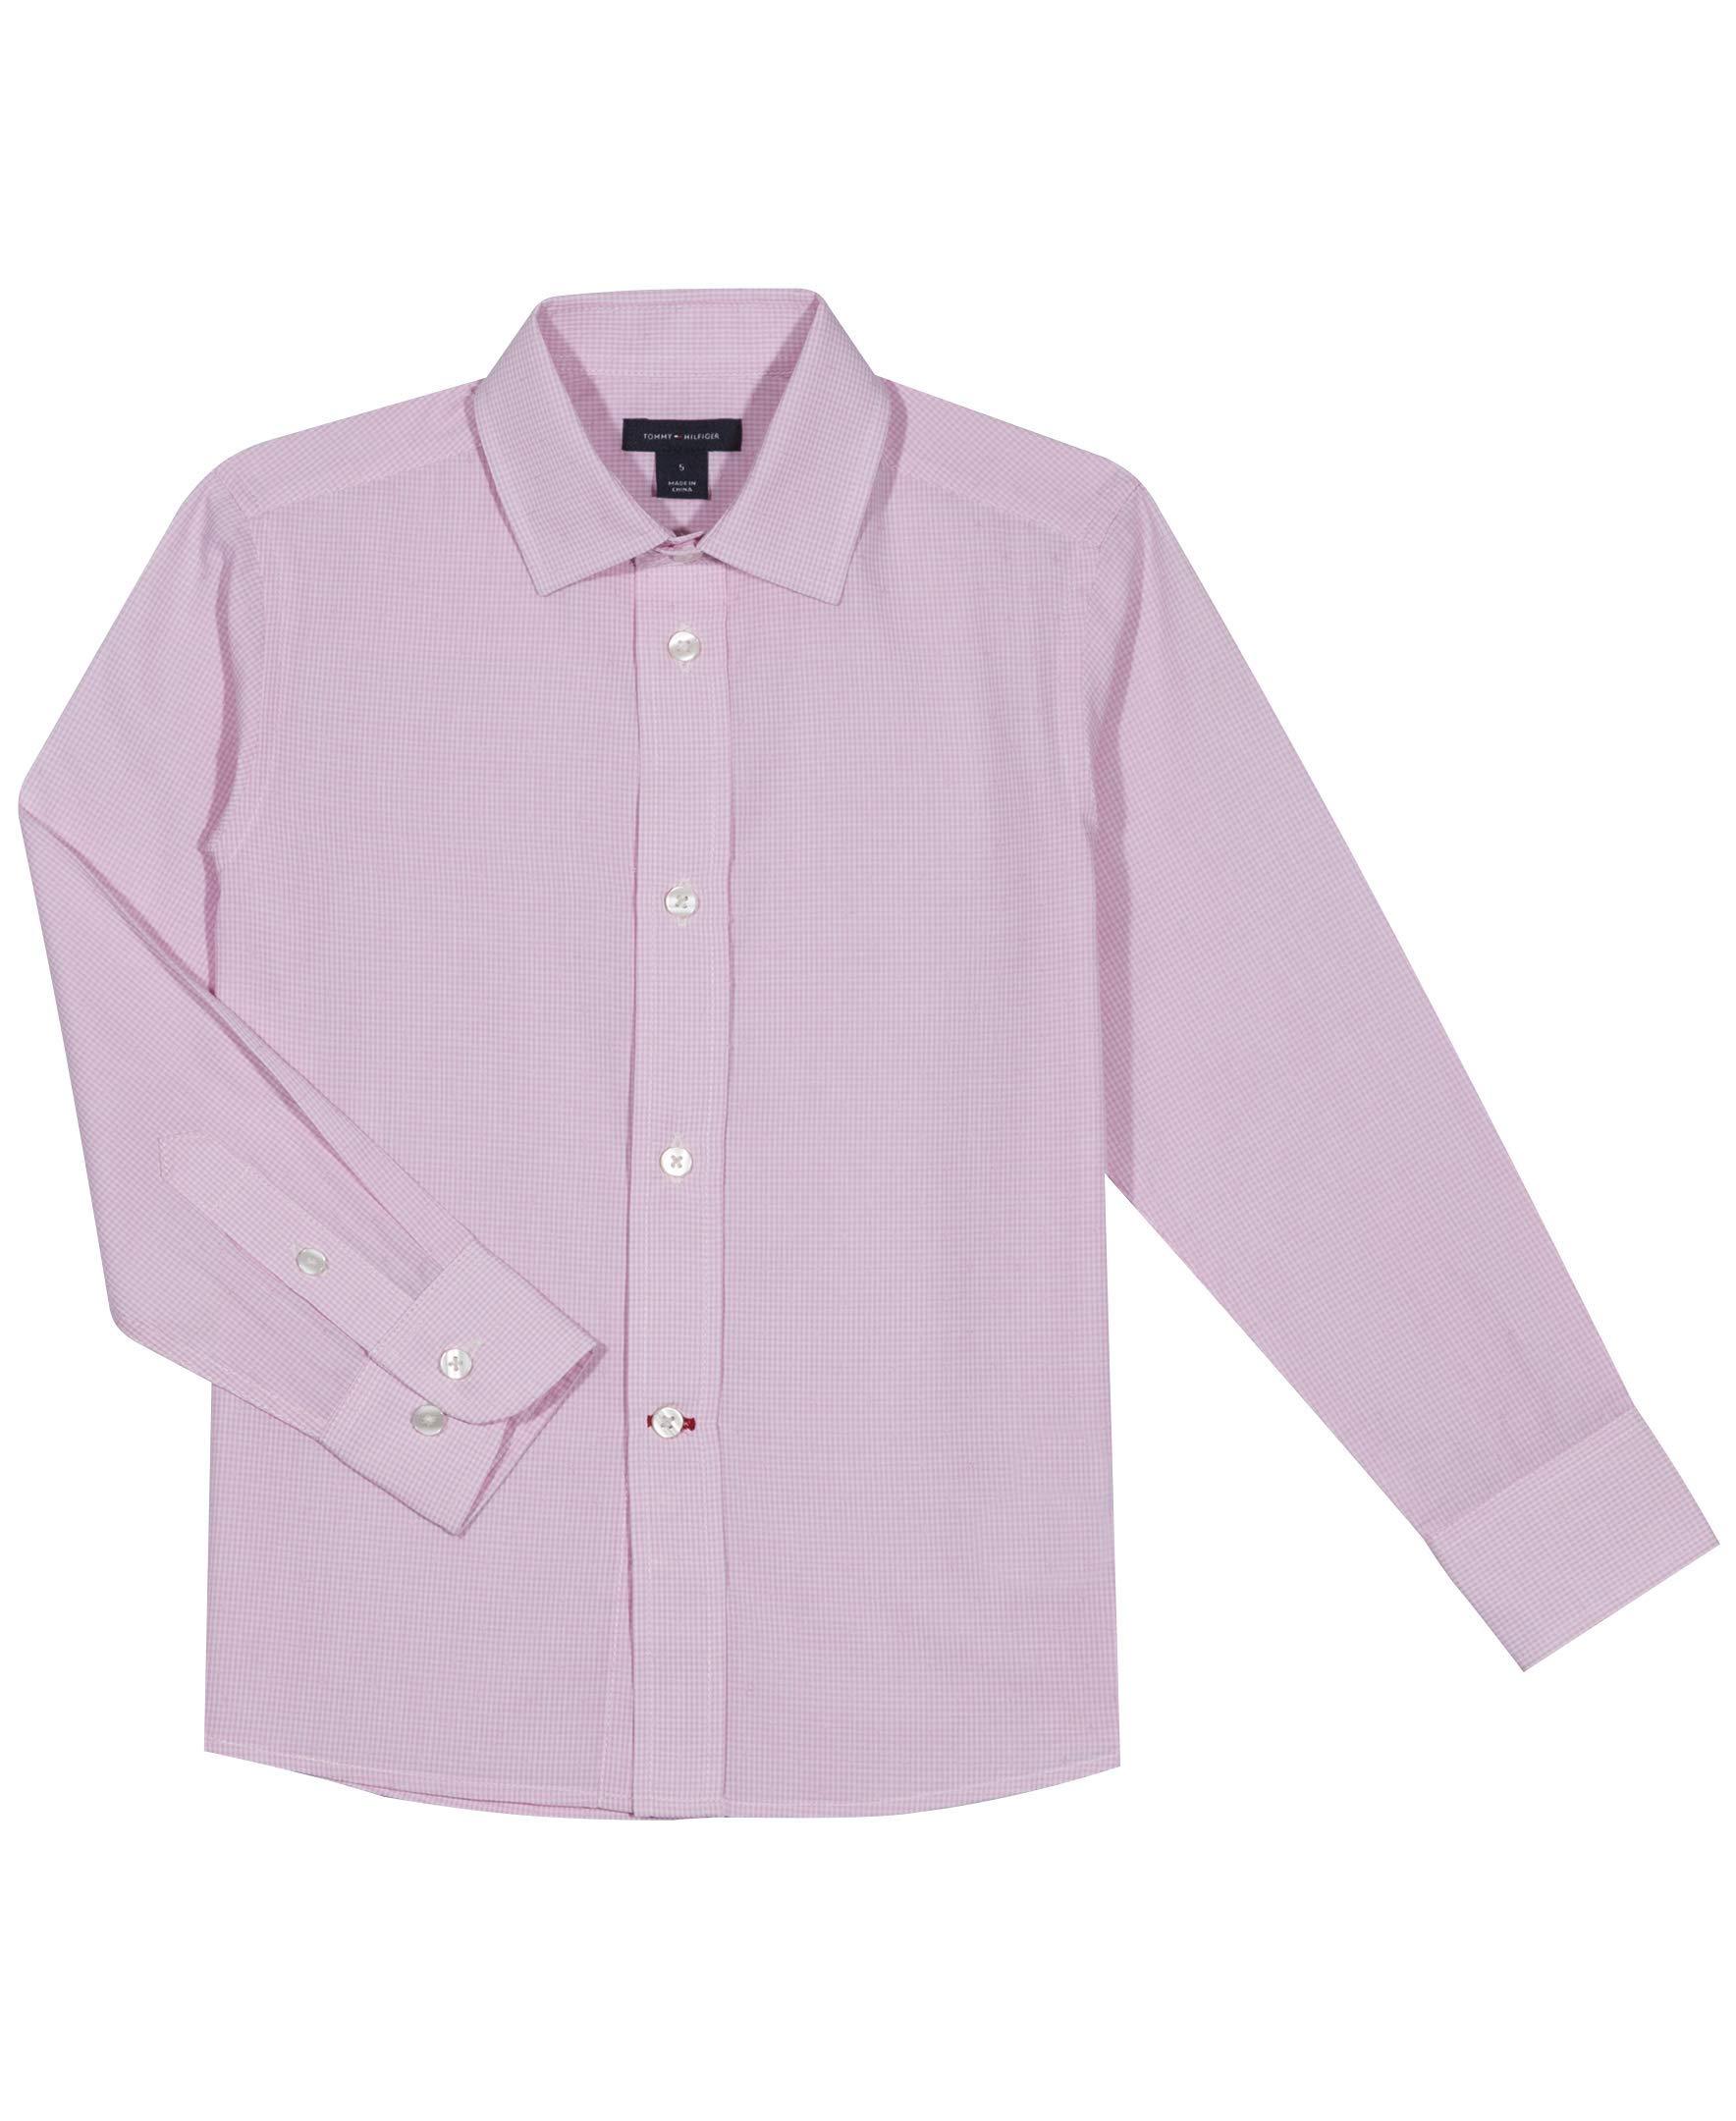 Tommy Hilfiger Boys' Cross Gingham Shirt, Light Pink, 16 by Tommy Hilfiger (Image #1)